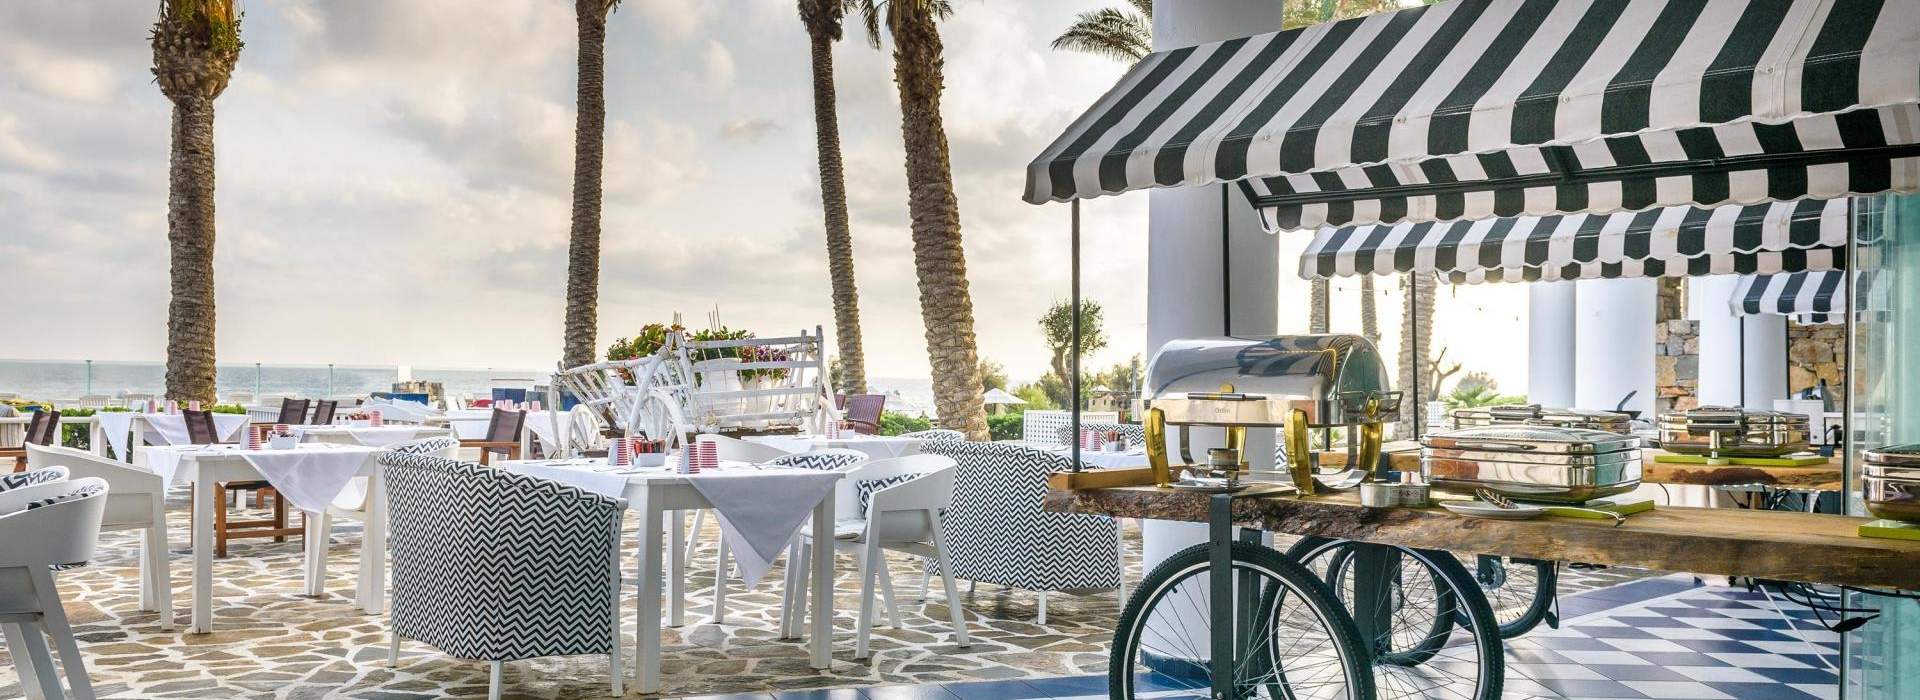 Radisson Blu Beach Resort Crete 5*